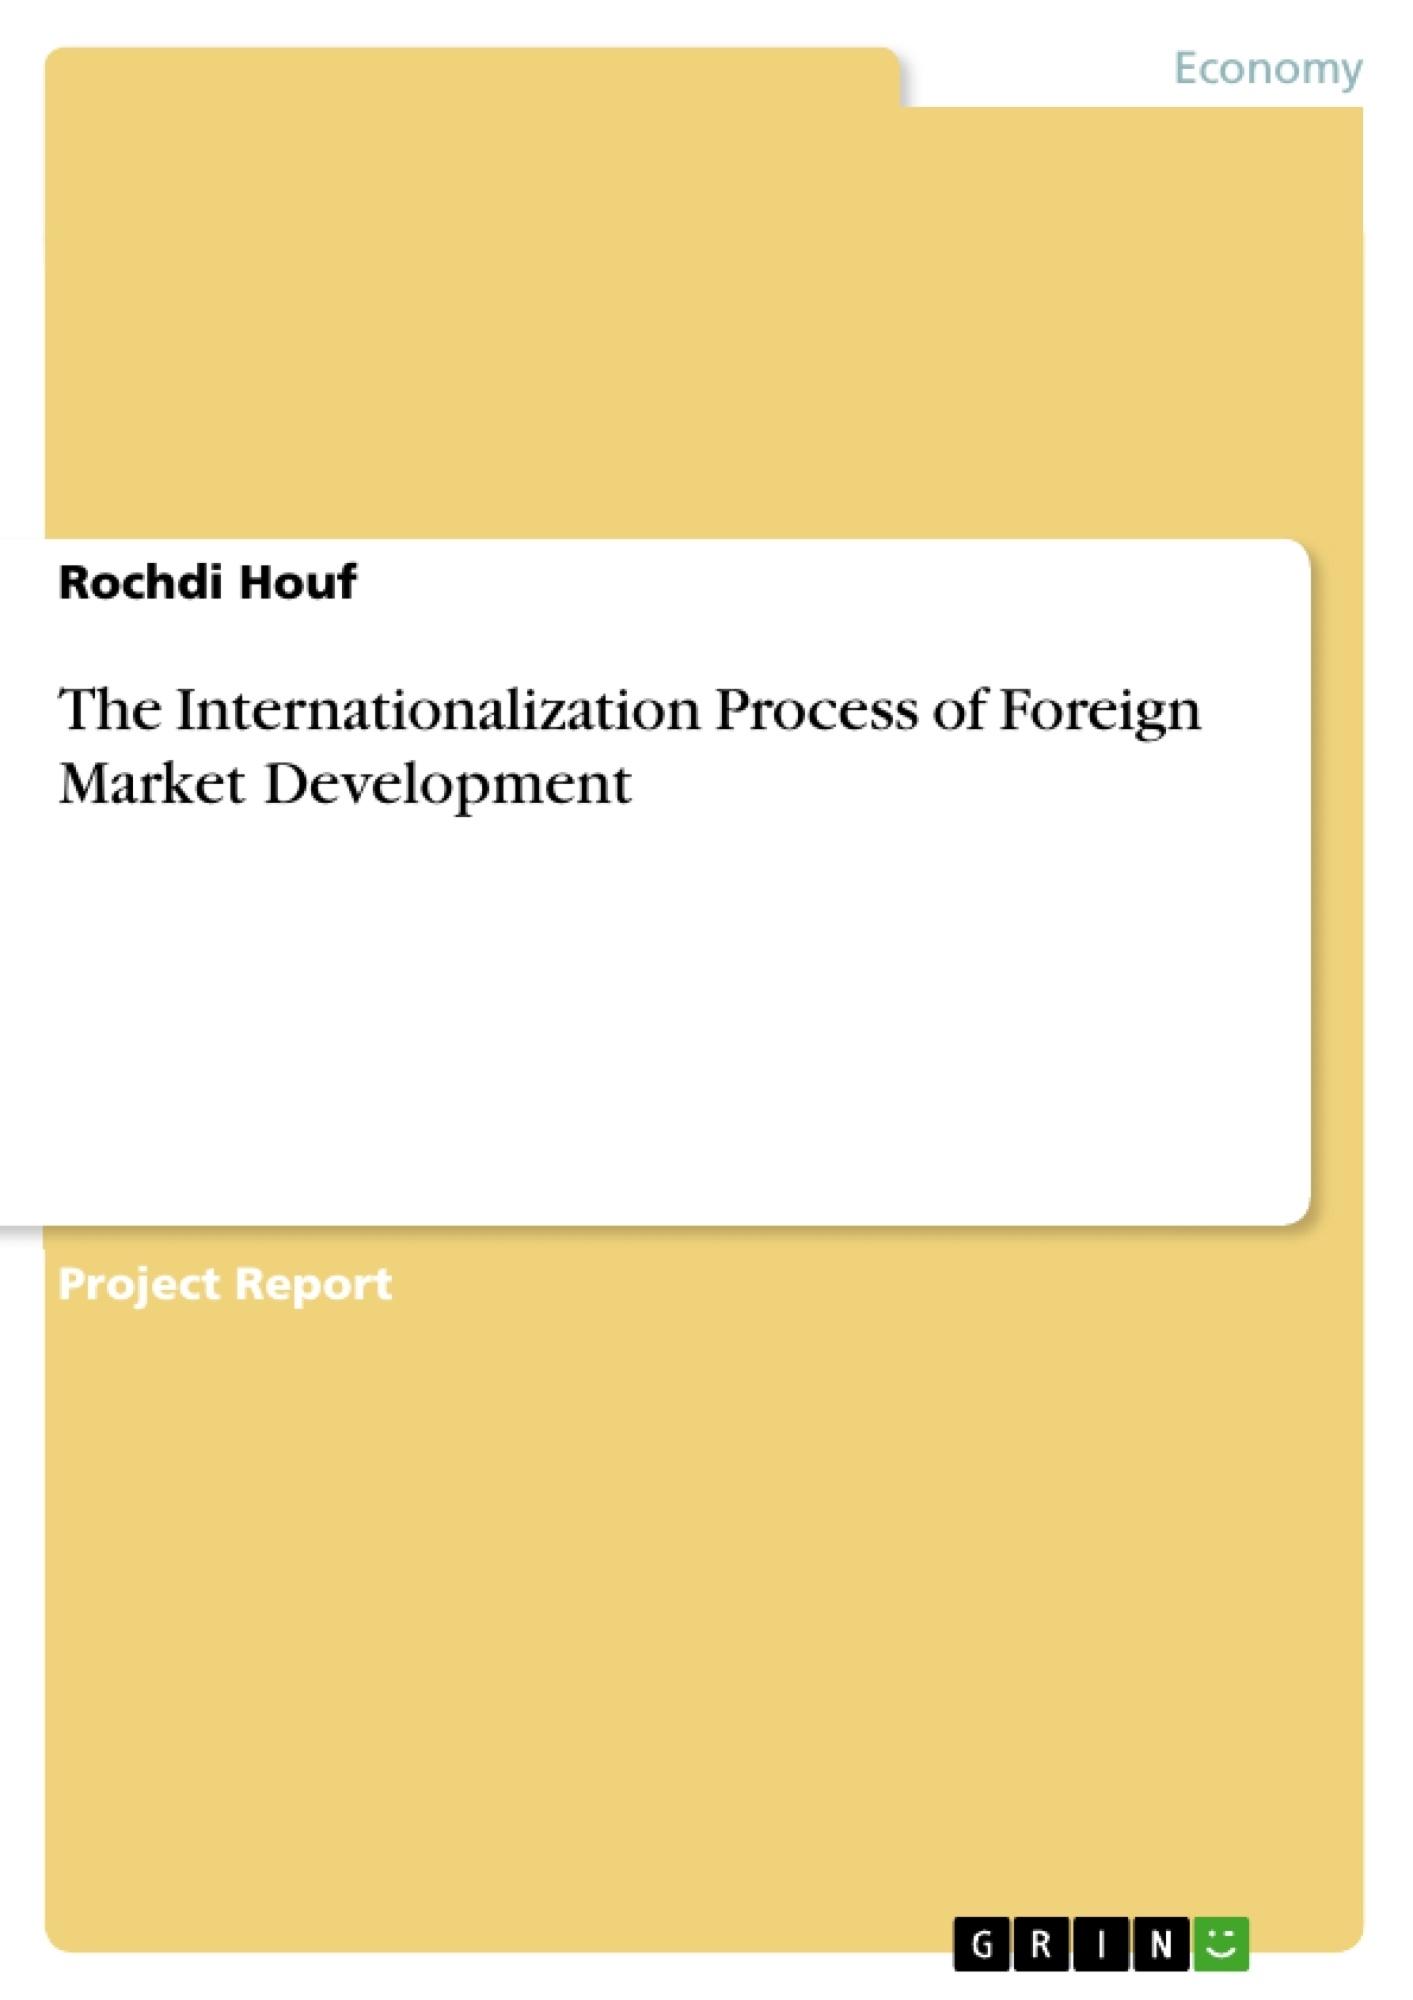 Title: The Internationalization Process of Foreign Market Development